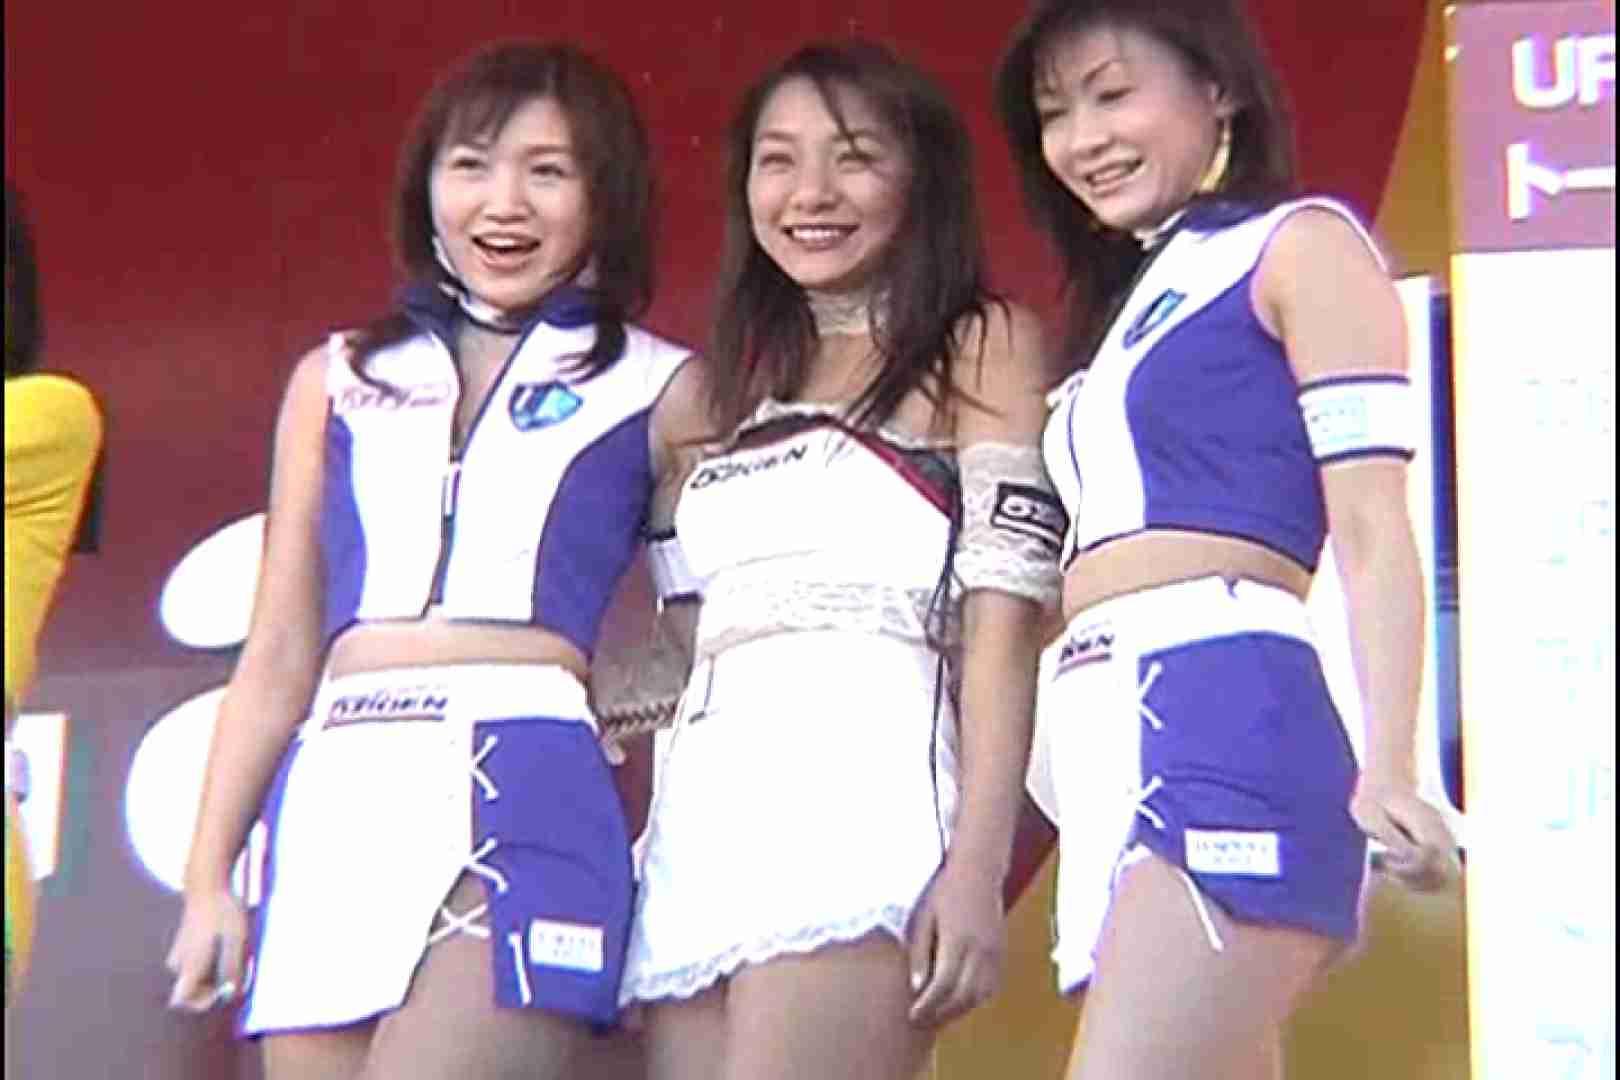 RQカメラ地獄Vol.10 望遠 盗み撮りオマンコ動画キャプチャ 74連発 38